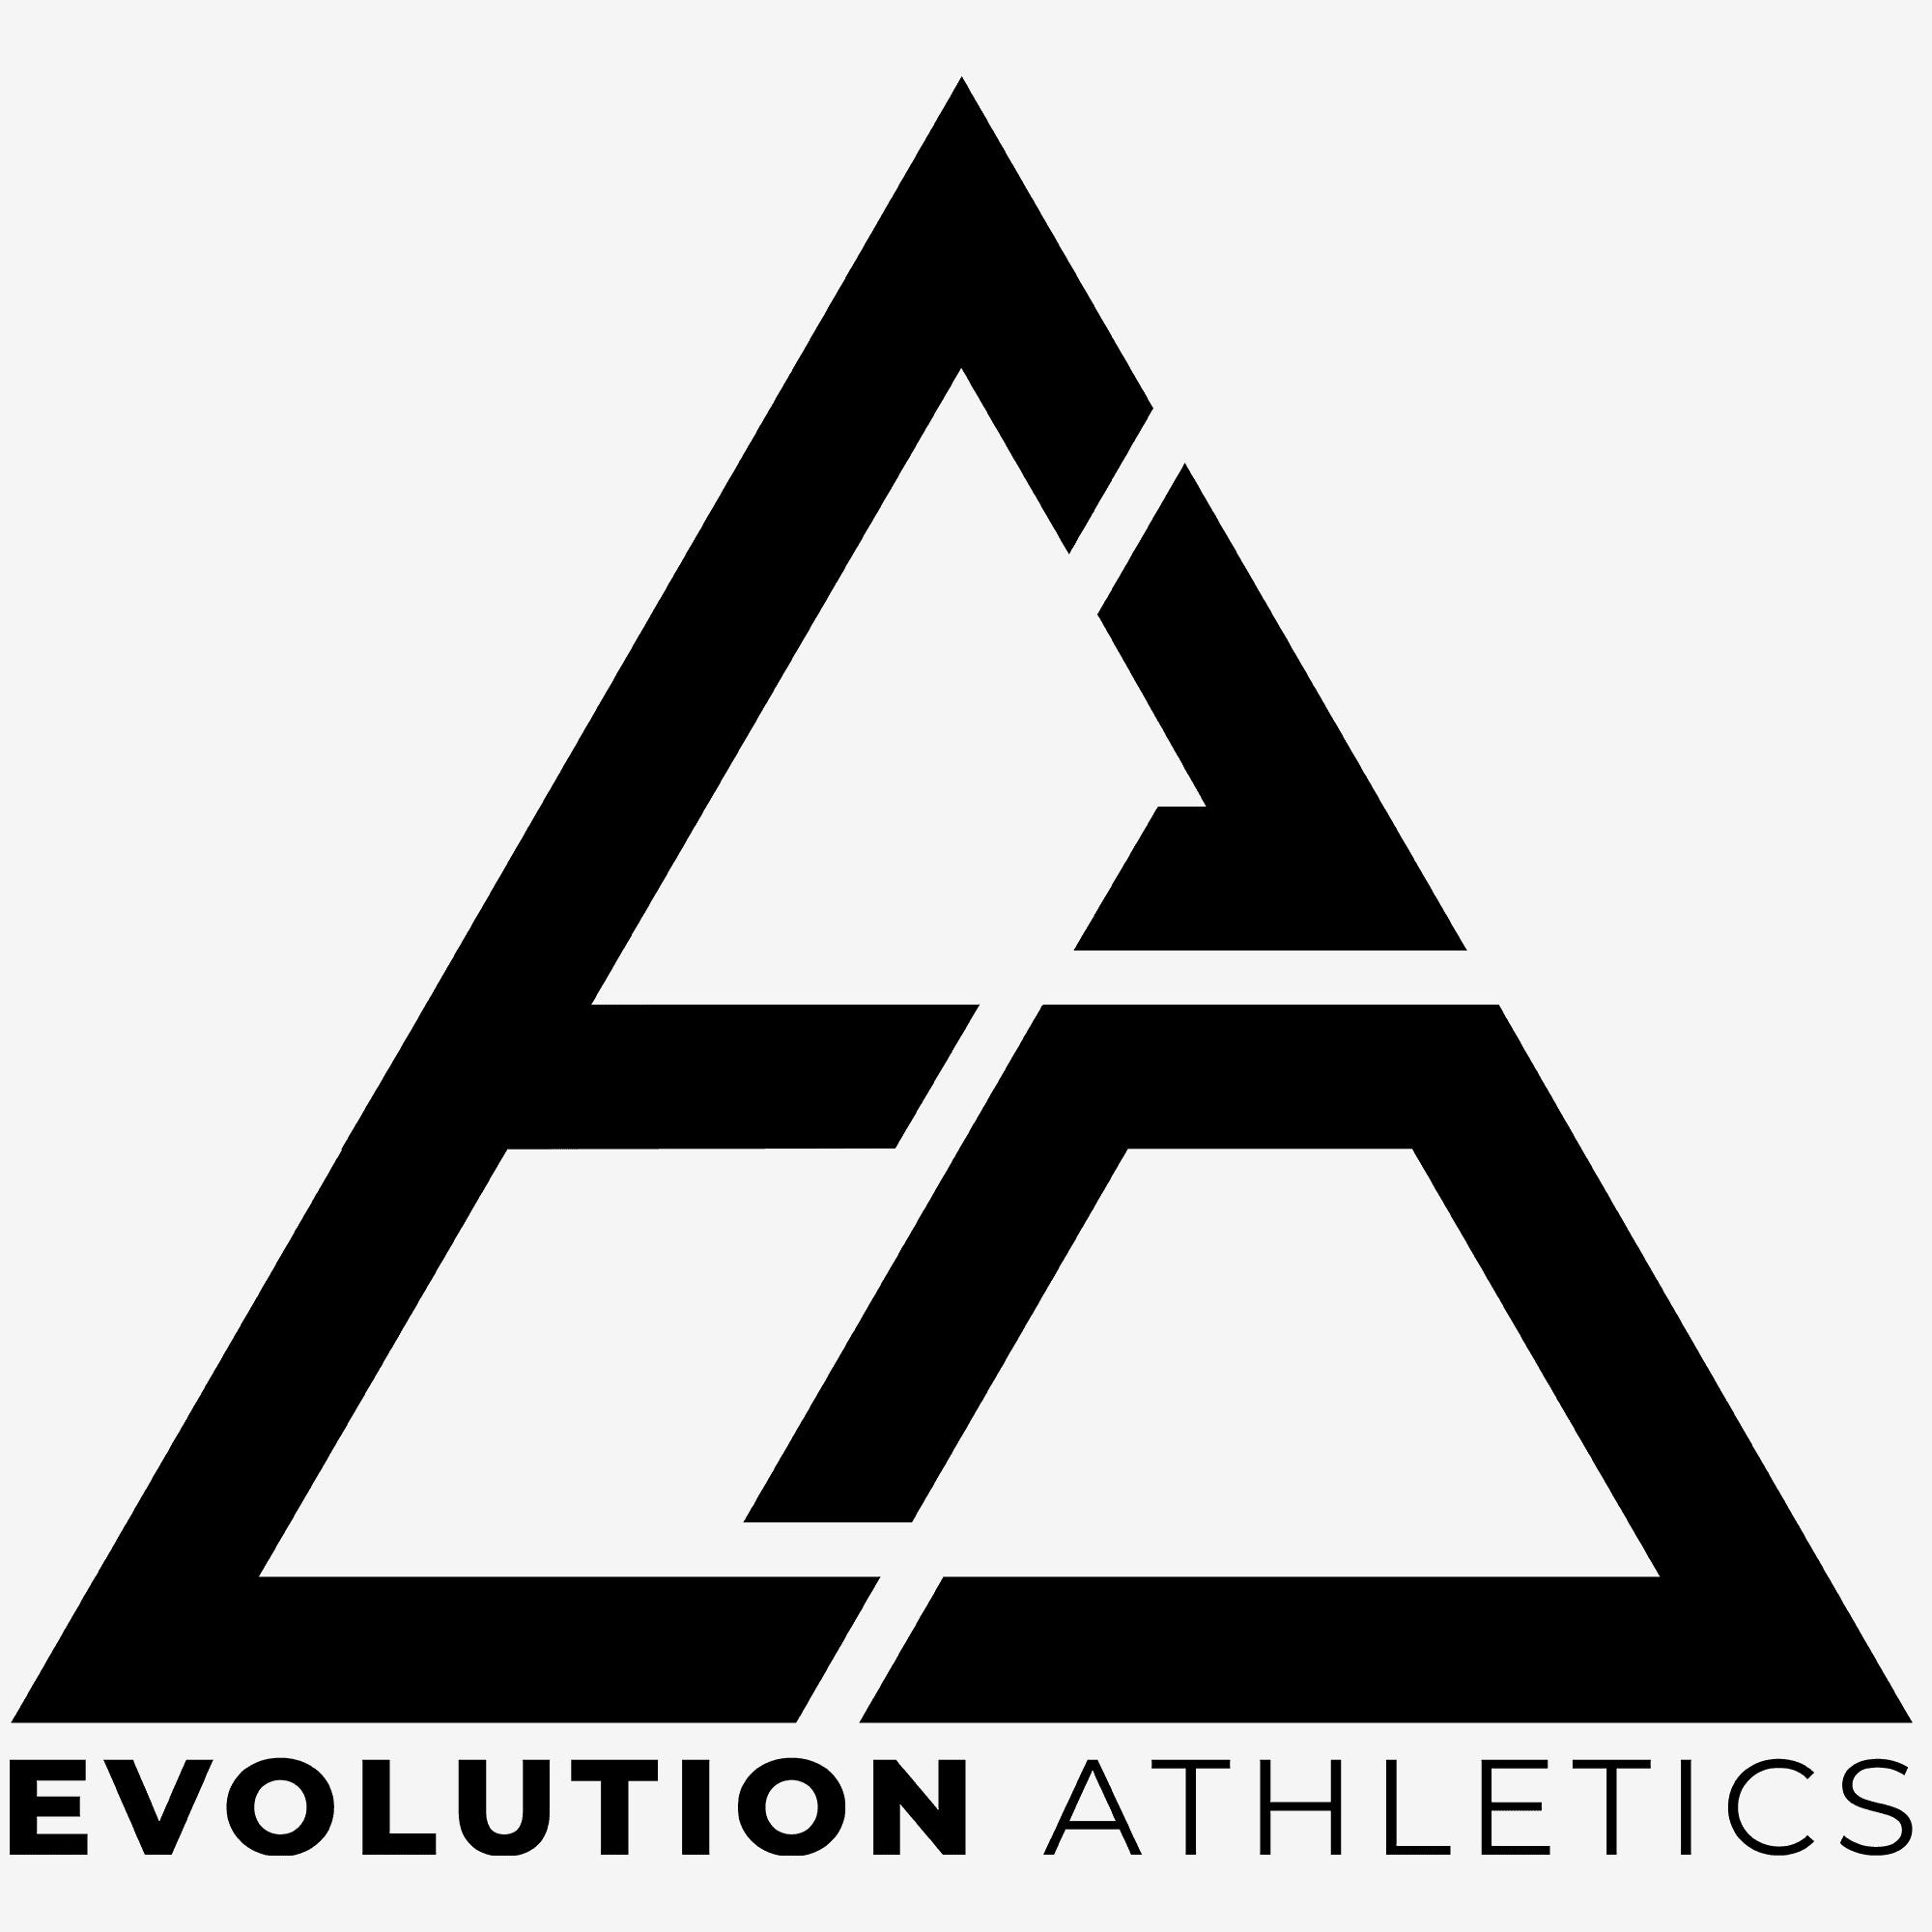 Evolution Athletics